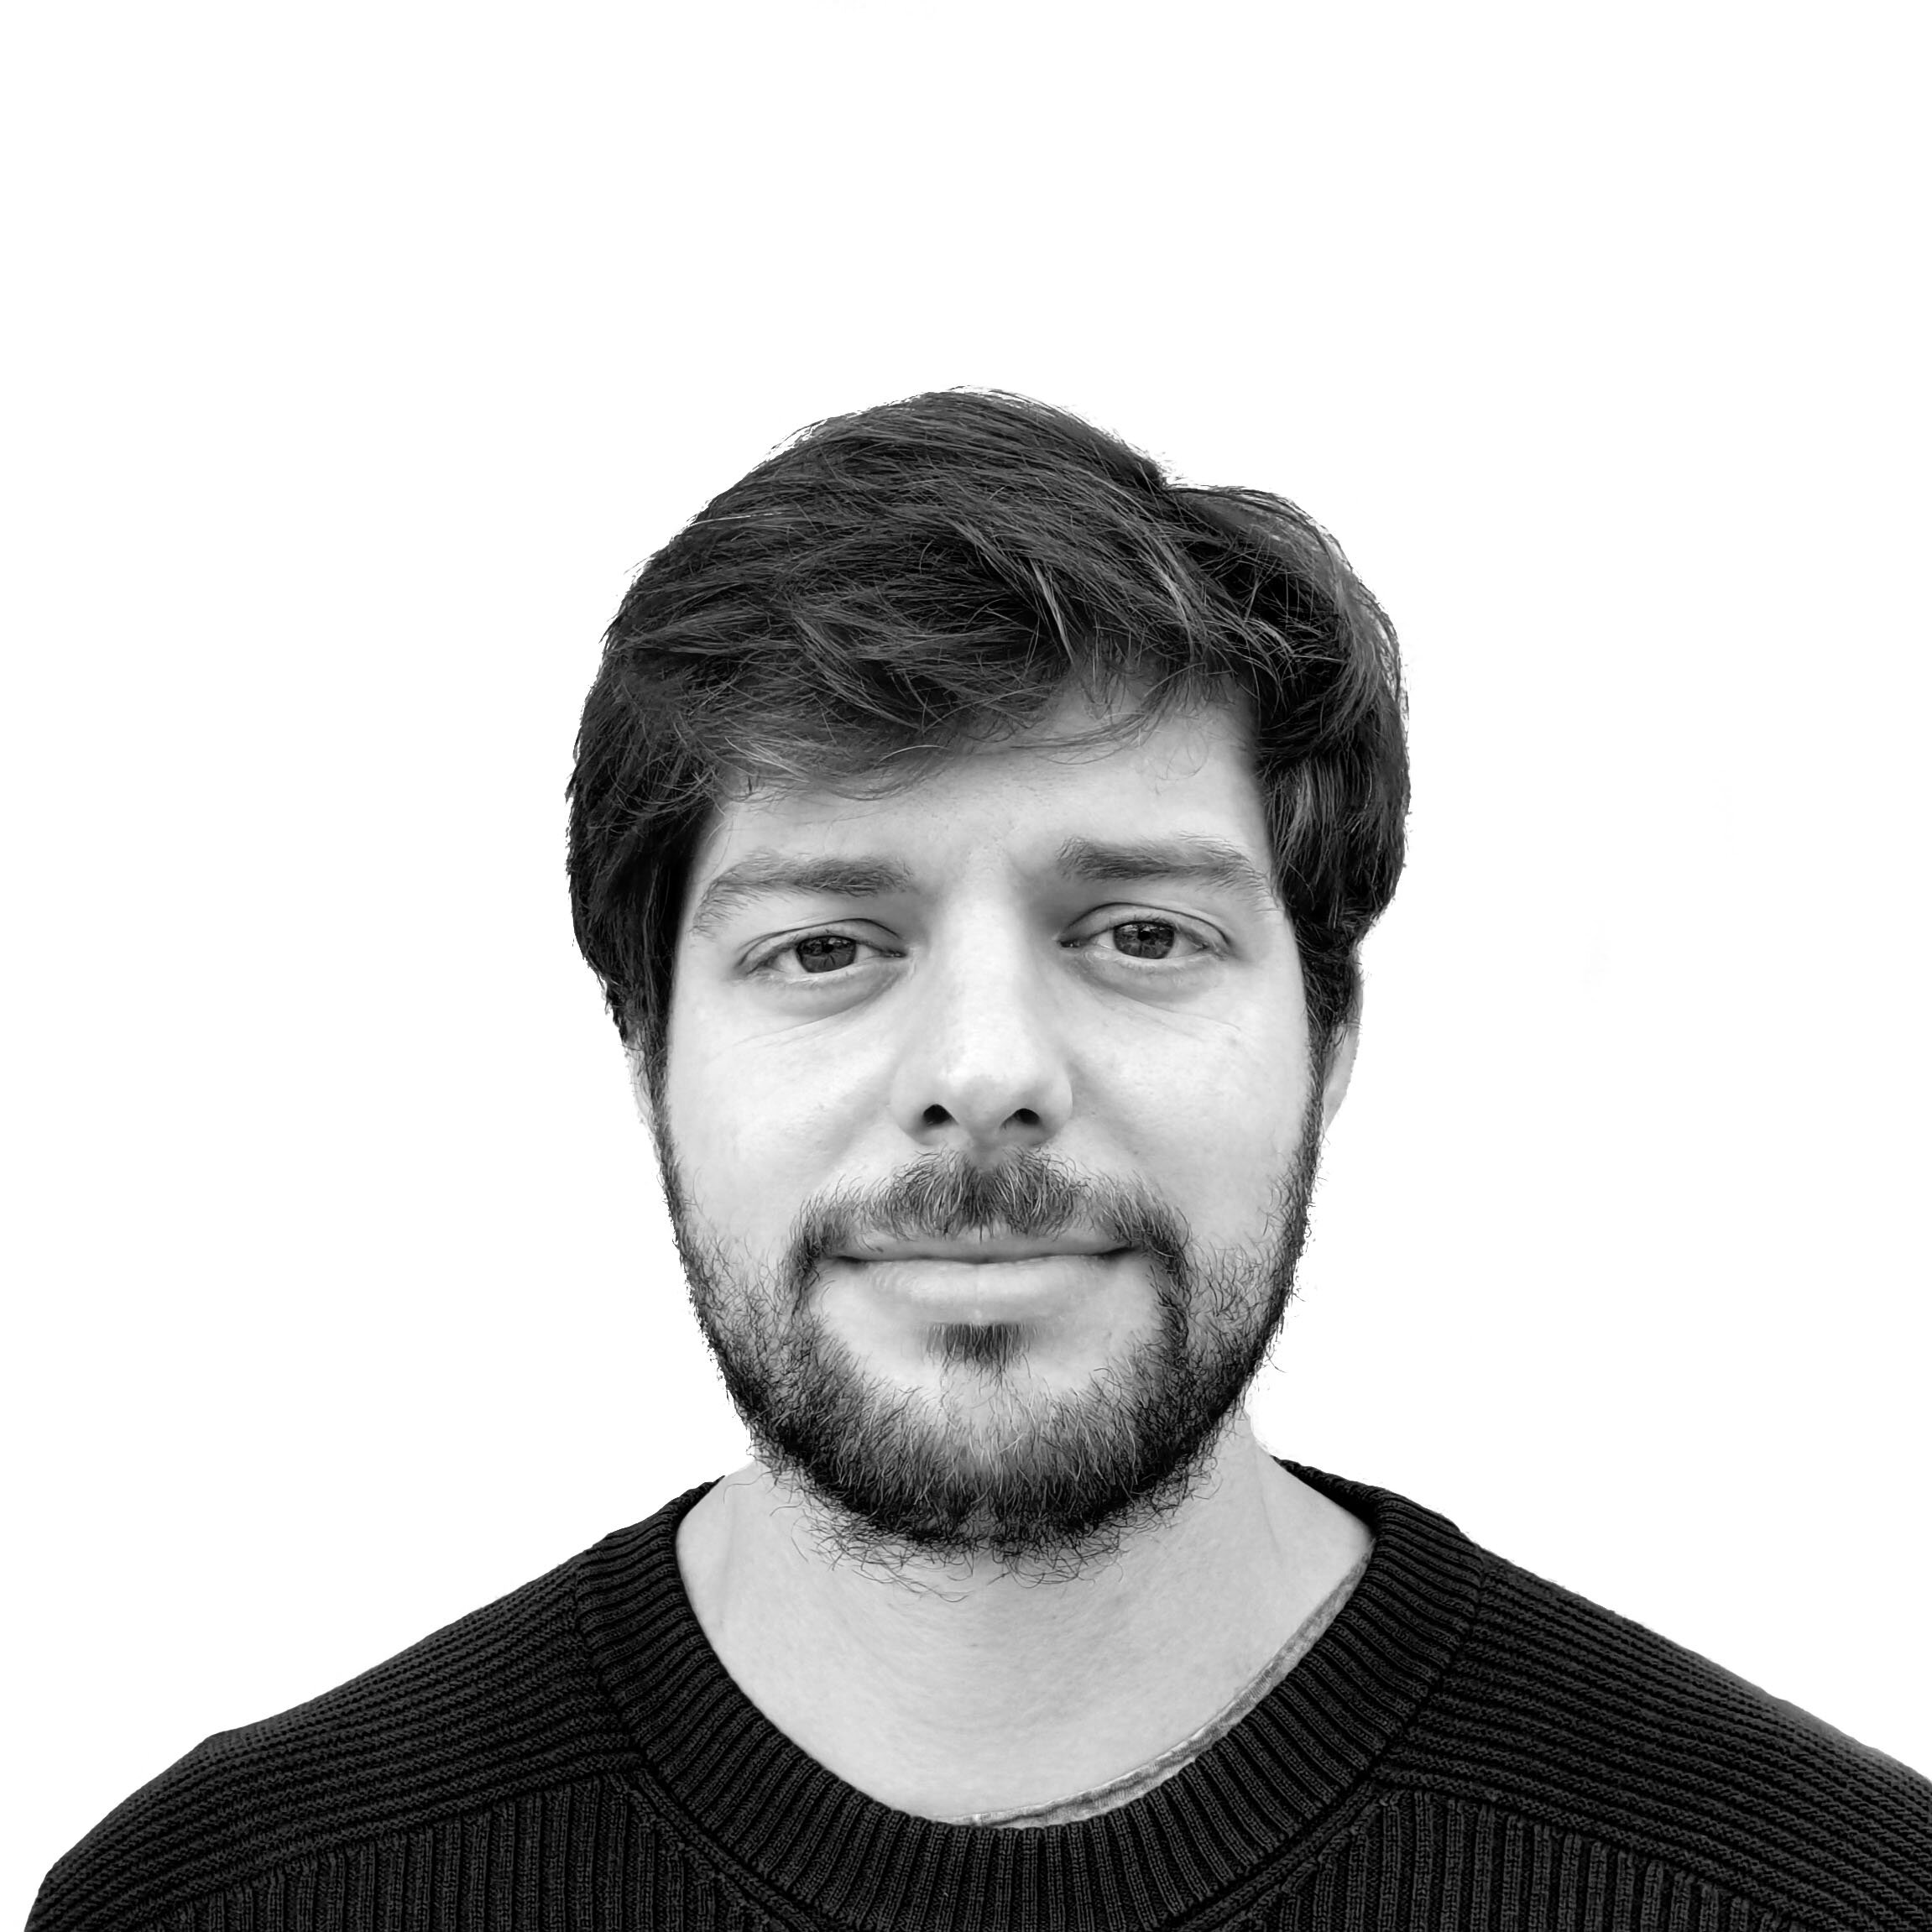 KEVIN DEFORTH | Software Engineer